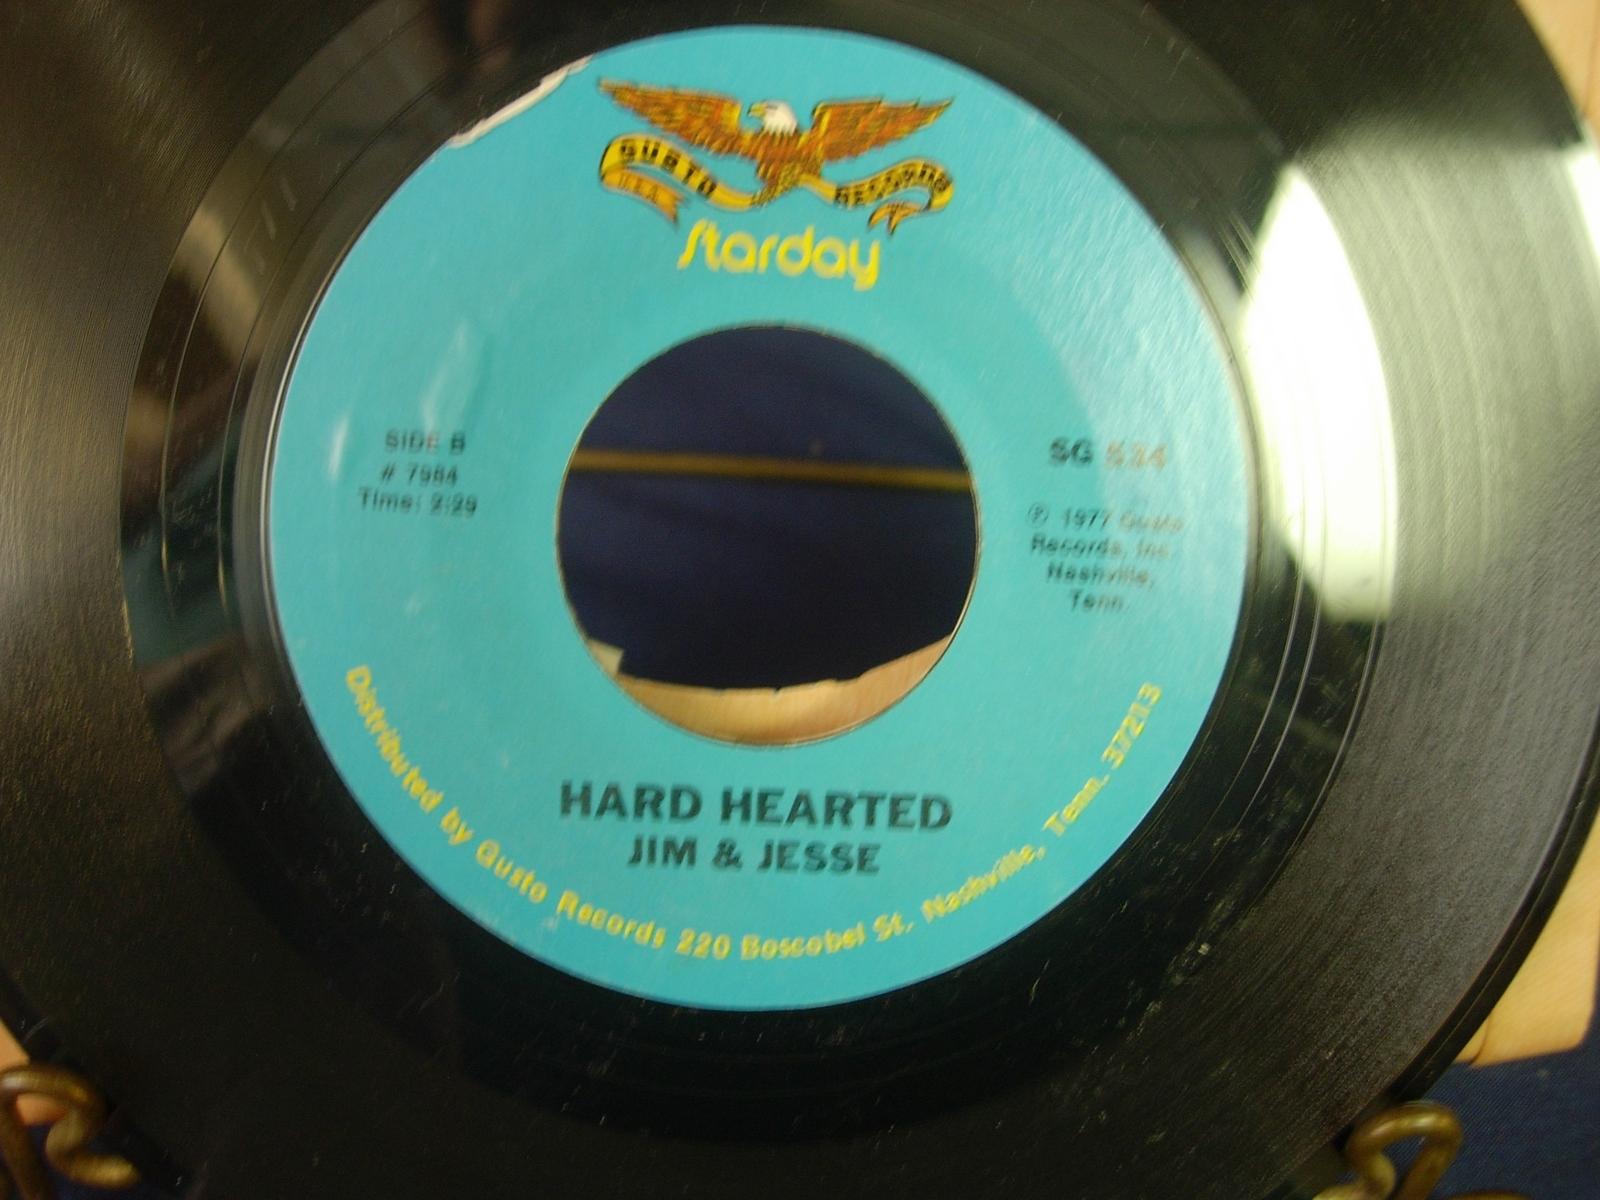 Jim & Jesse - Pardon Me / Hard Hearted - Starday SG 534